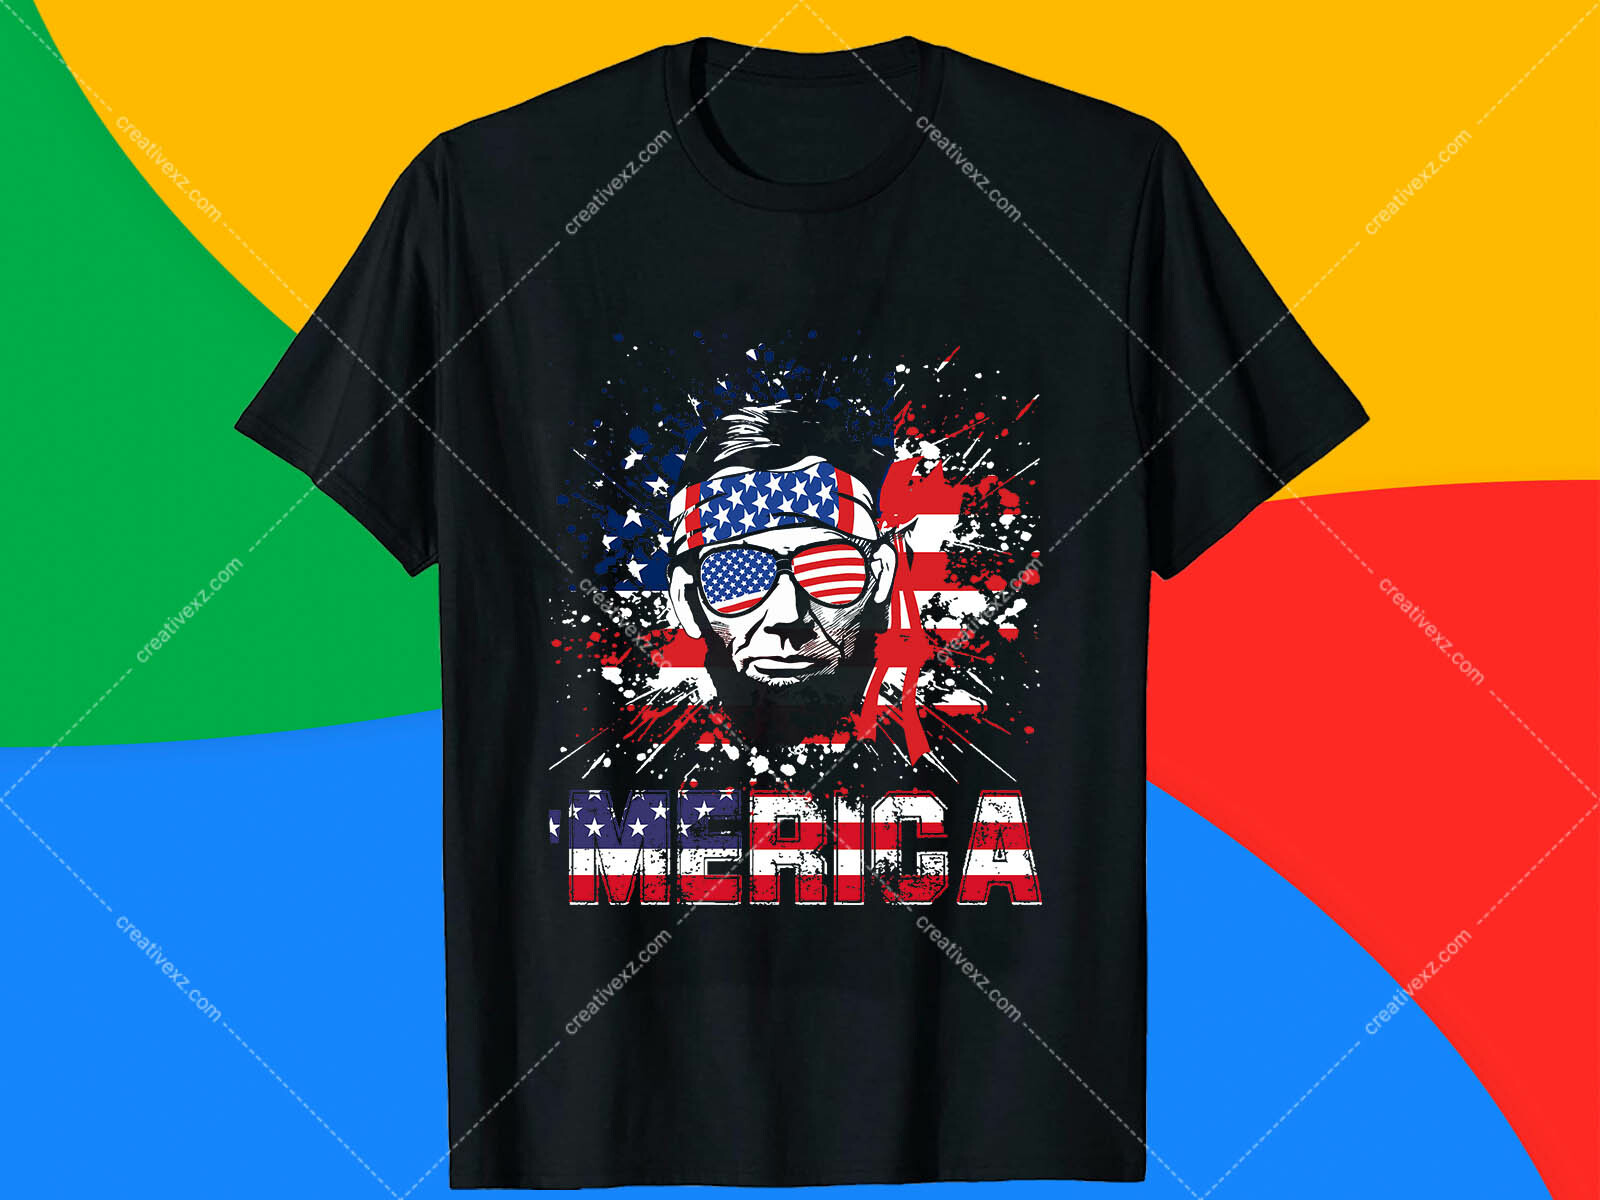 Roger Islam Abe Drinkin T Shirt Design Free Download